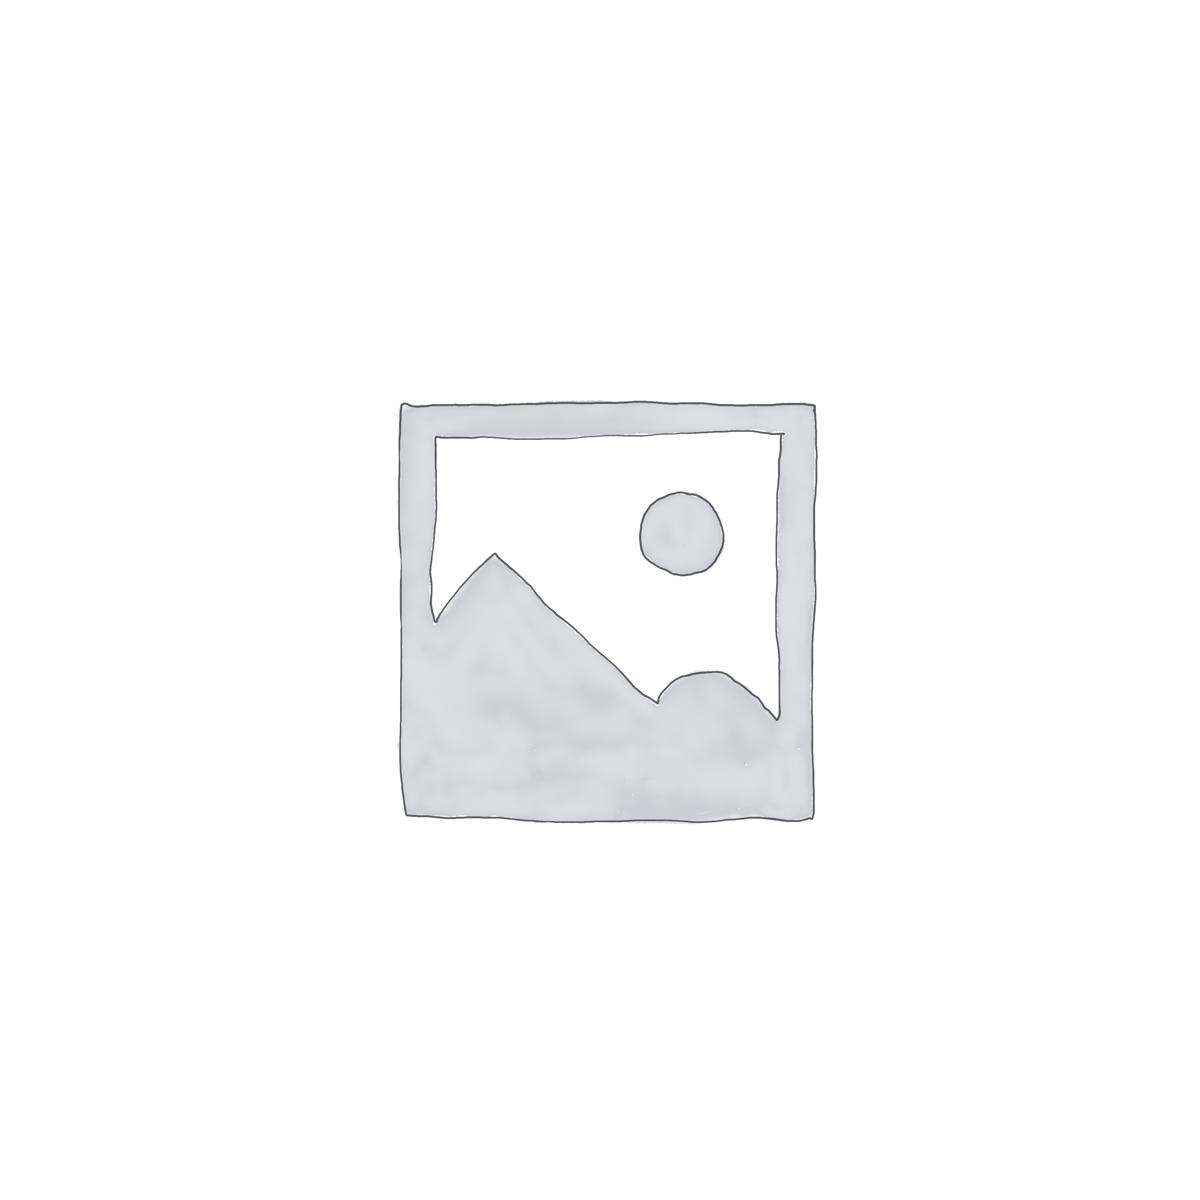 3D Embossed Look Cement Sculpture Floral Wallpaper Mural